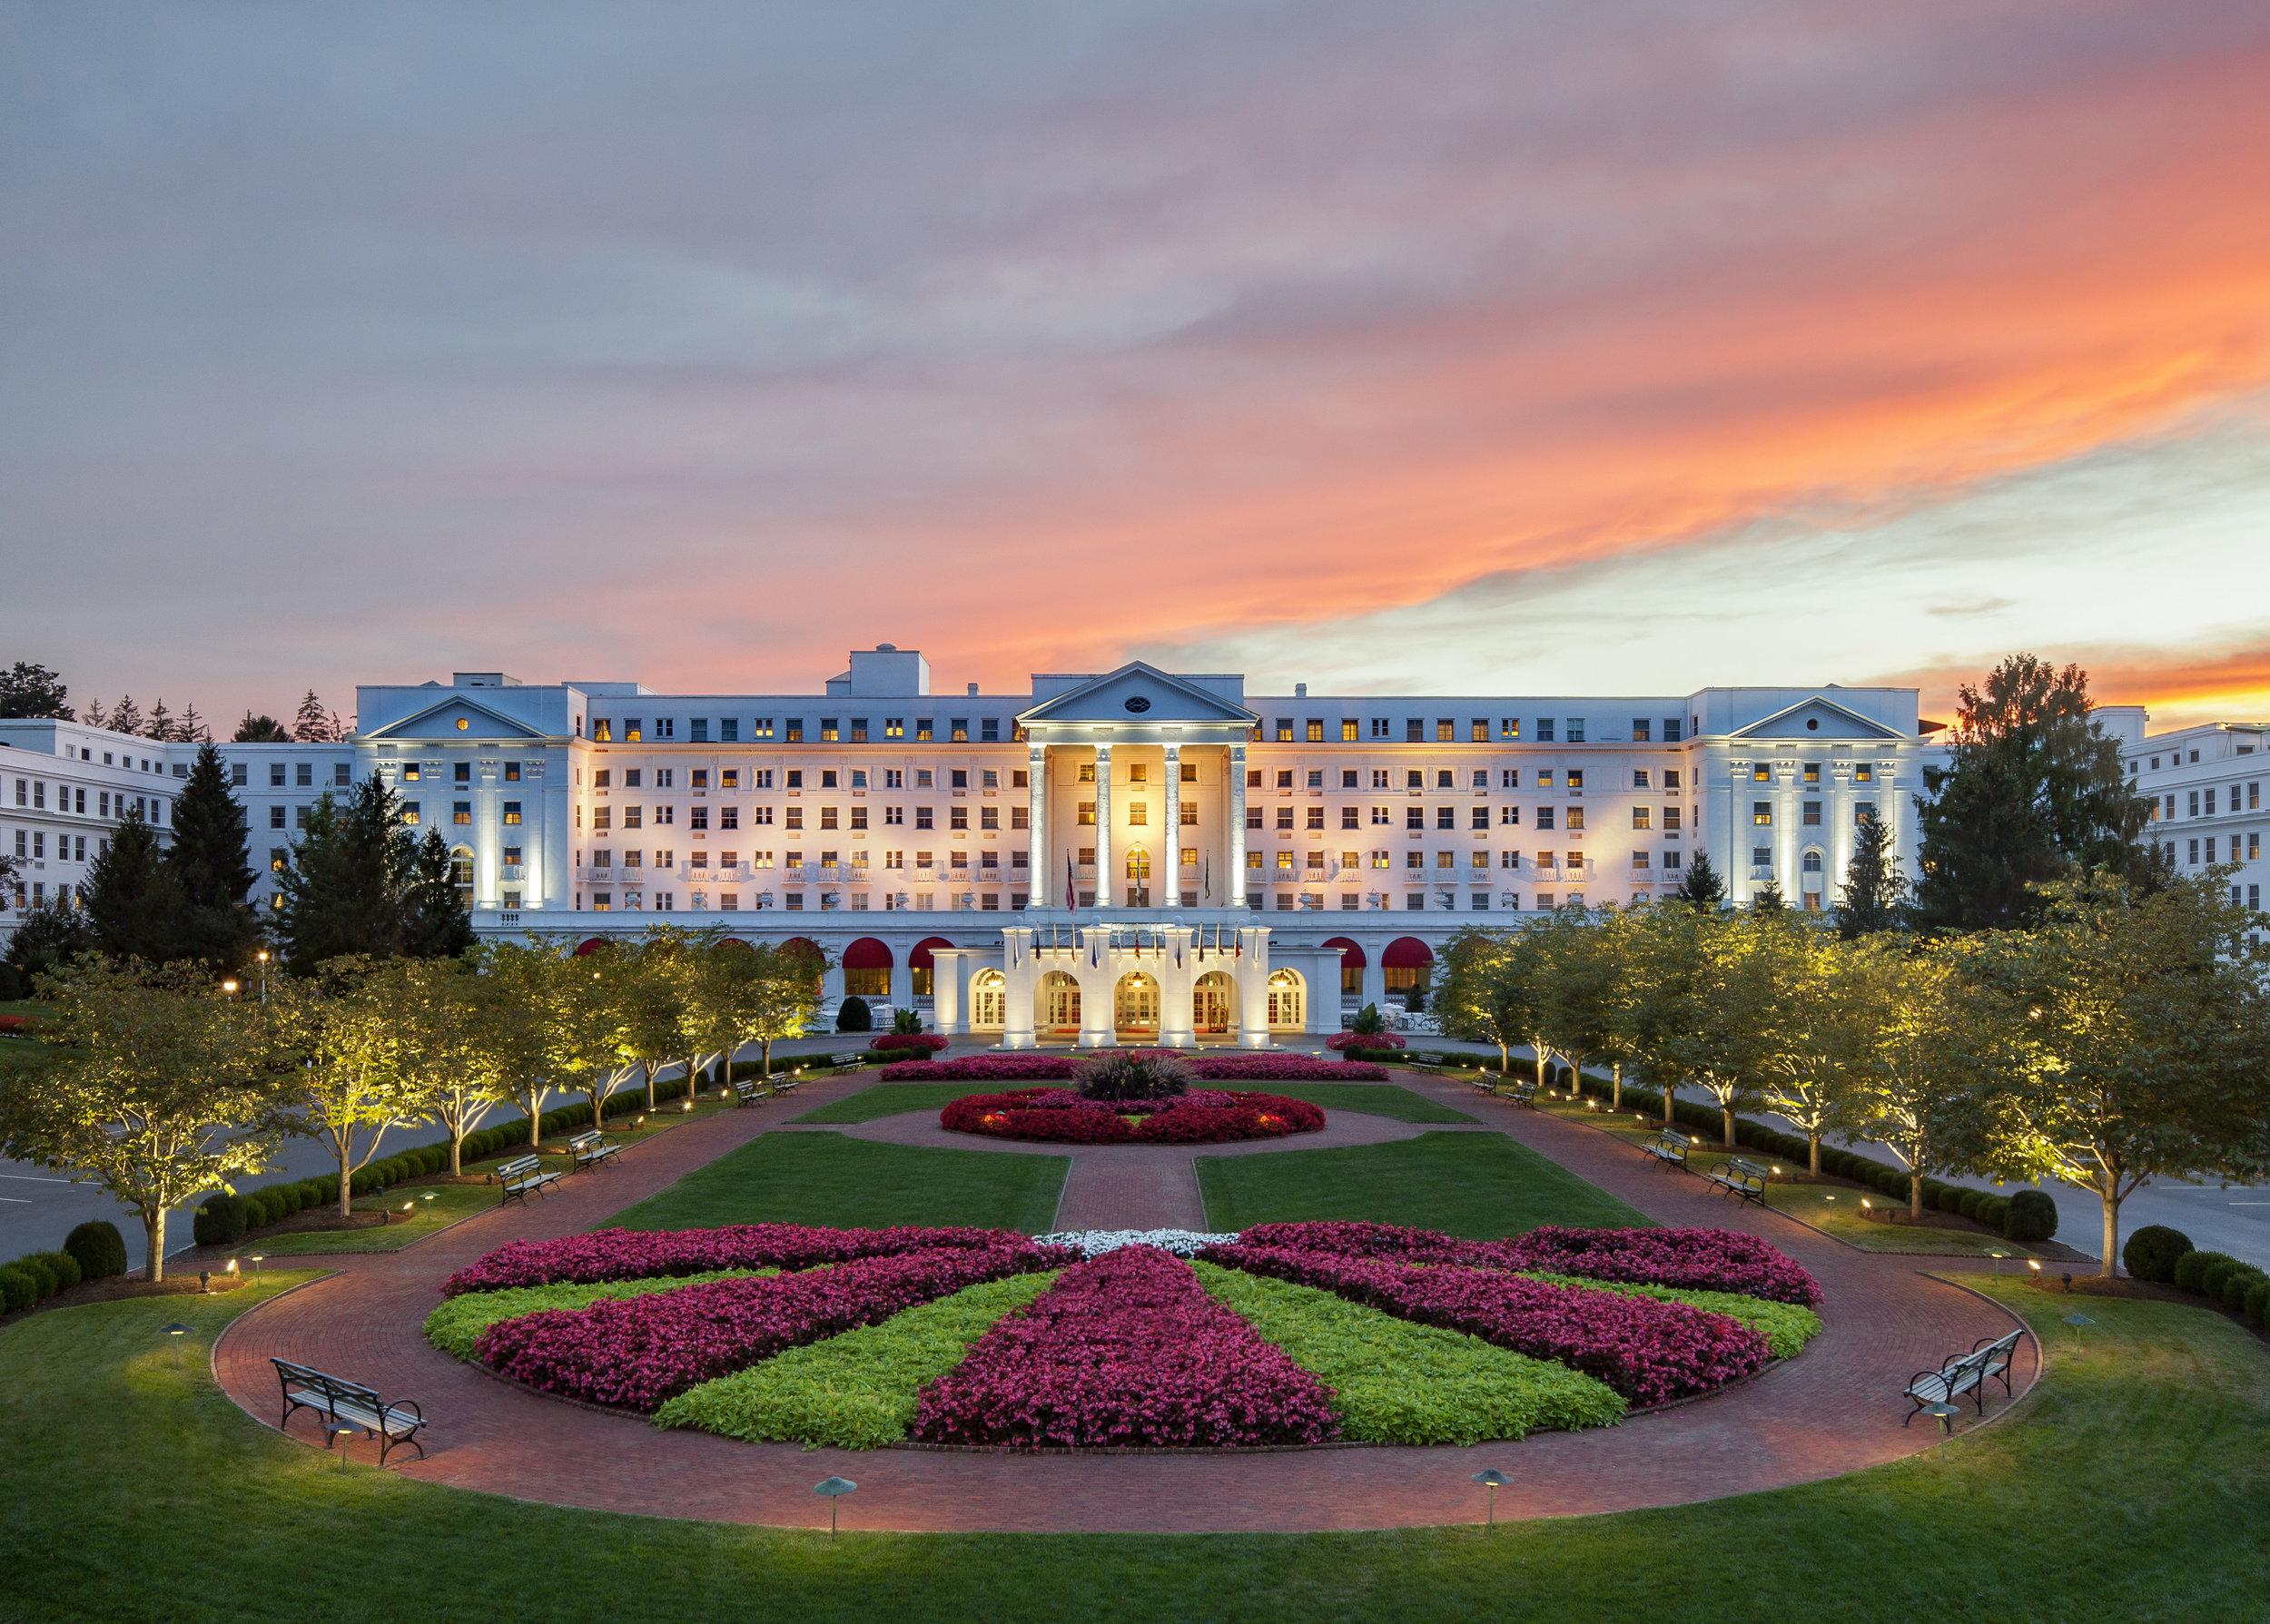 greenbrier hotel.jpg